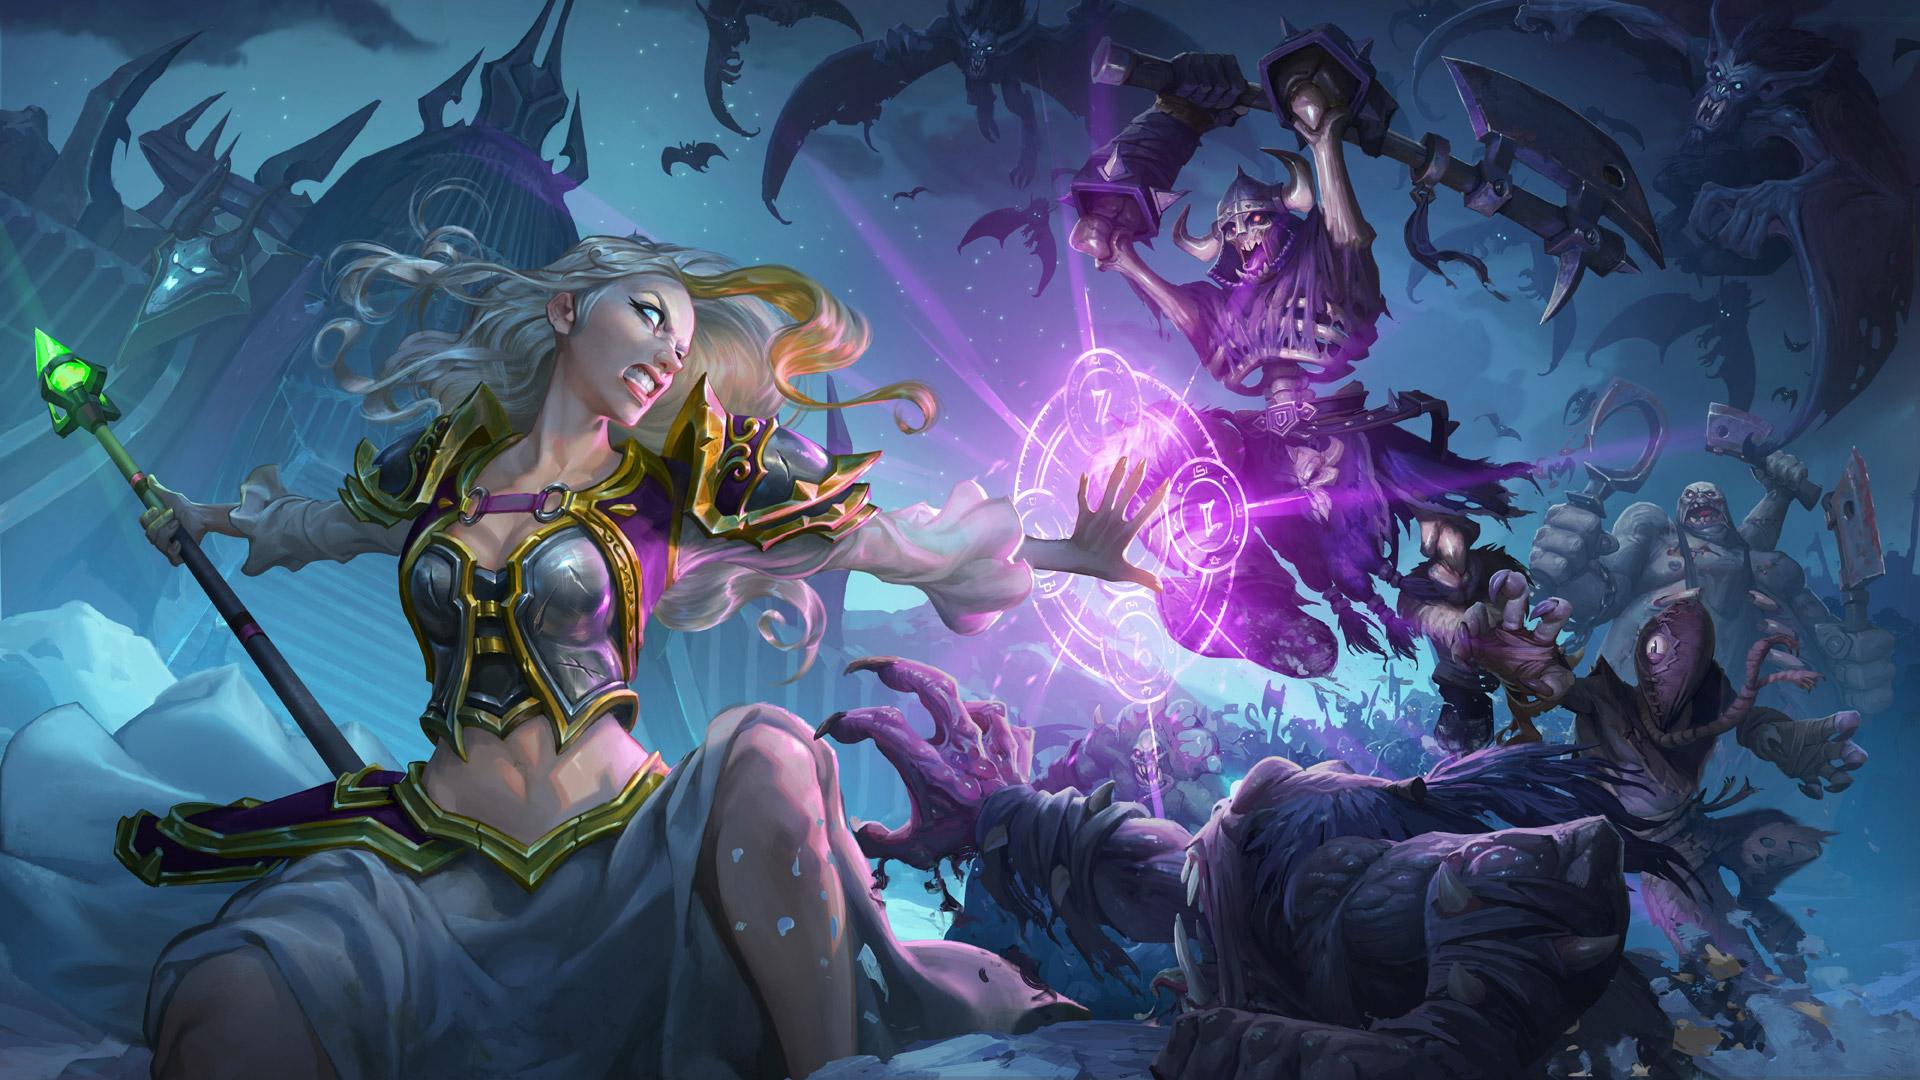 Free Hearthstone: Heroes of Warcraft Wallpaper in 1920x1080